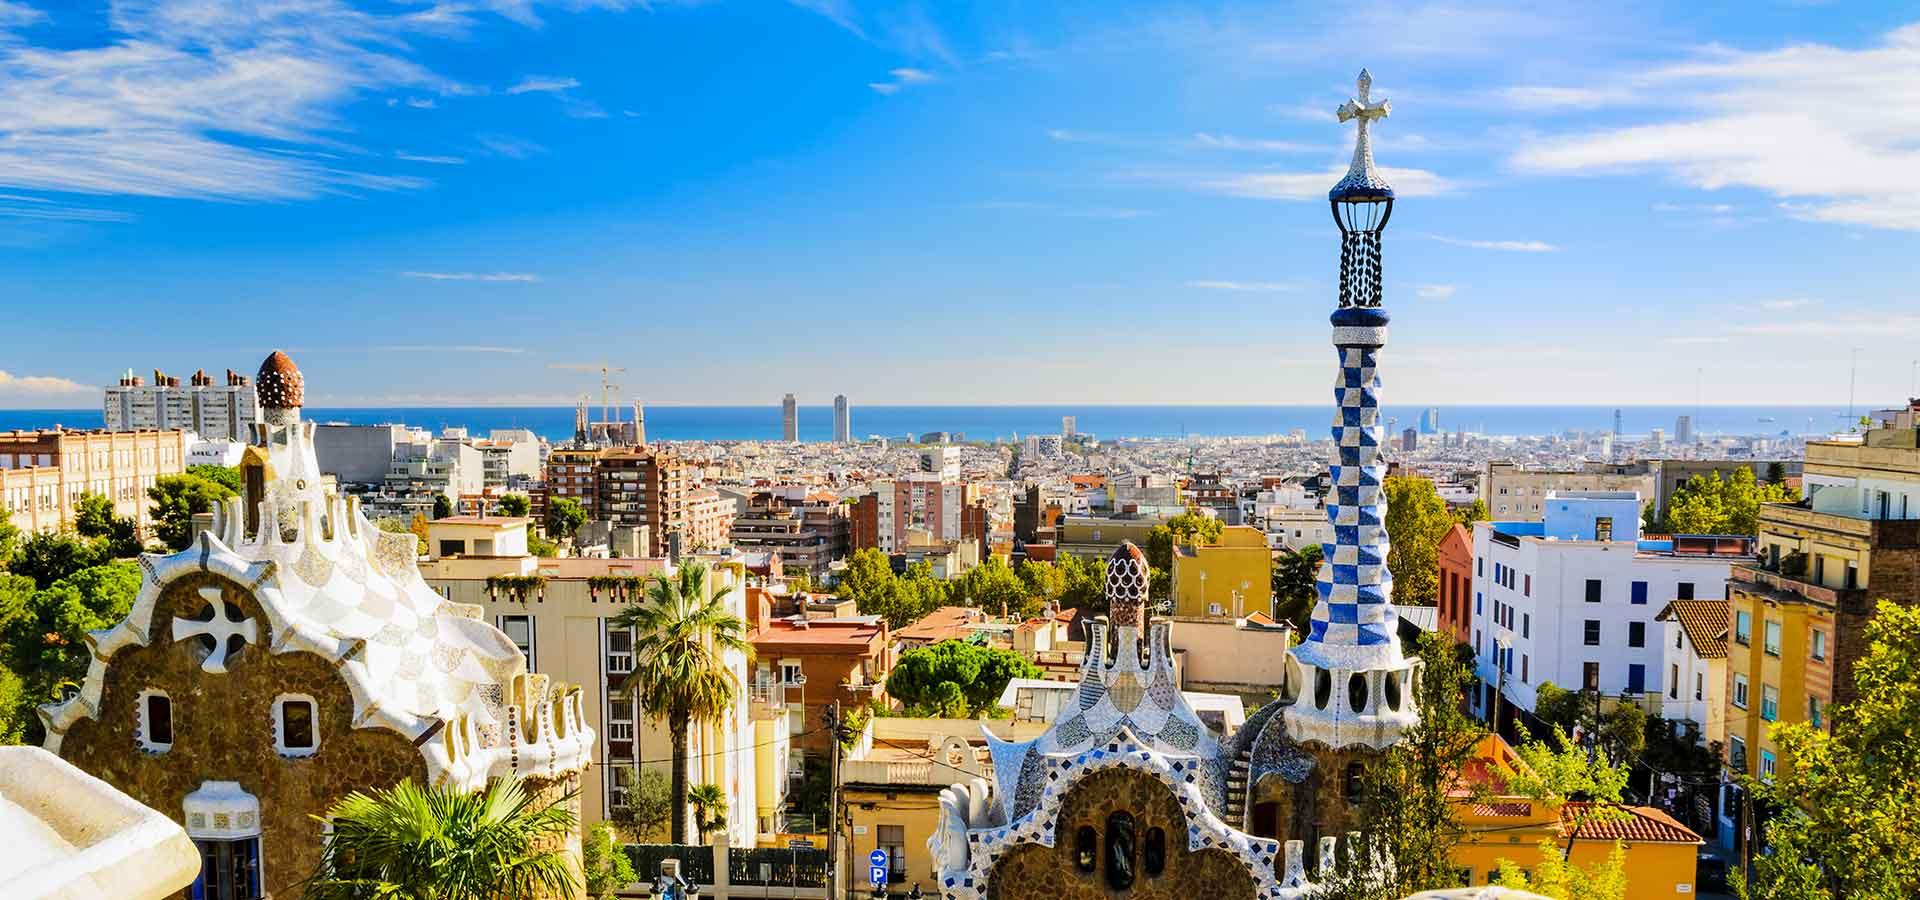 Voyages-Traditours-Espagne-Barcelone-Parc-Guell